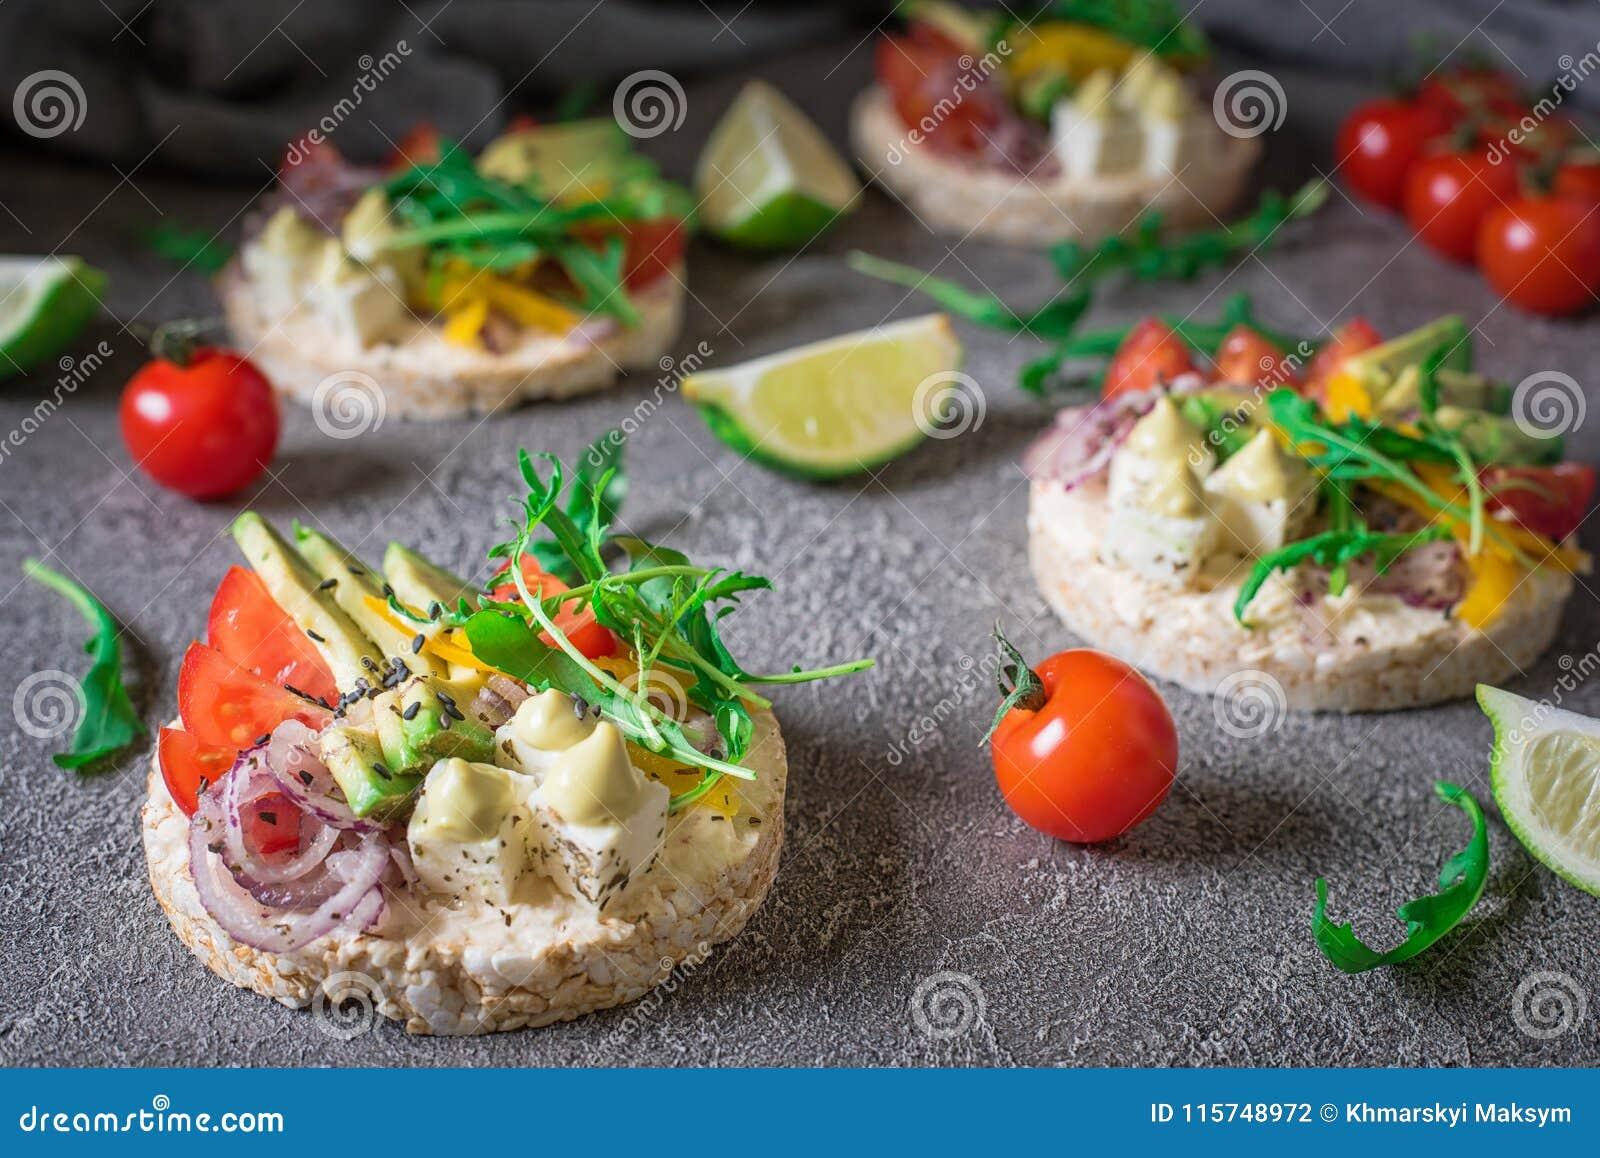 Bruschetta met tomaat, avocado, kruiden en arugula Rustieke achtergrond Hoogste mening